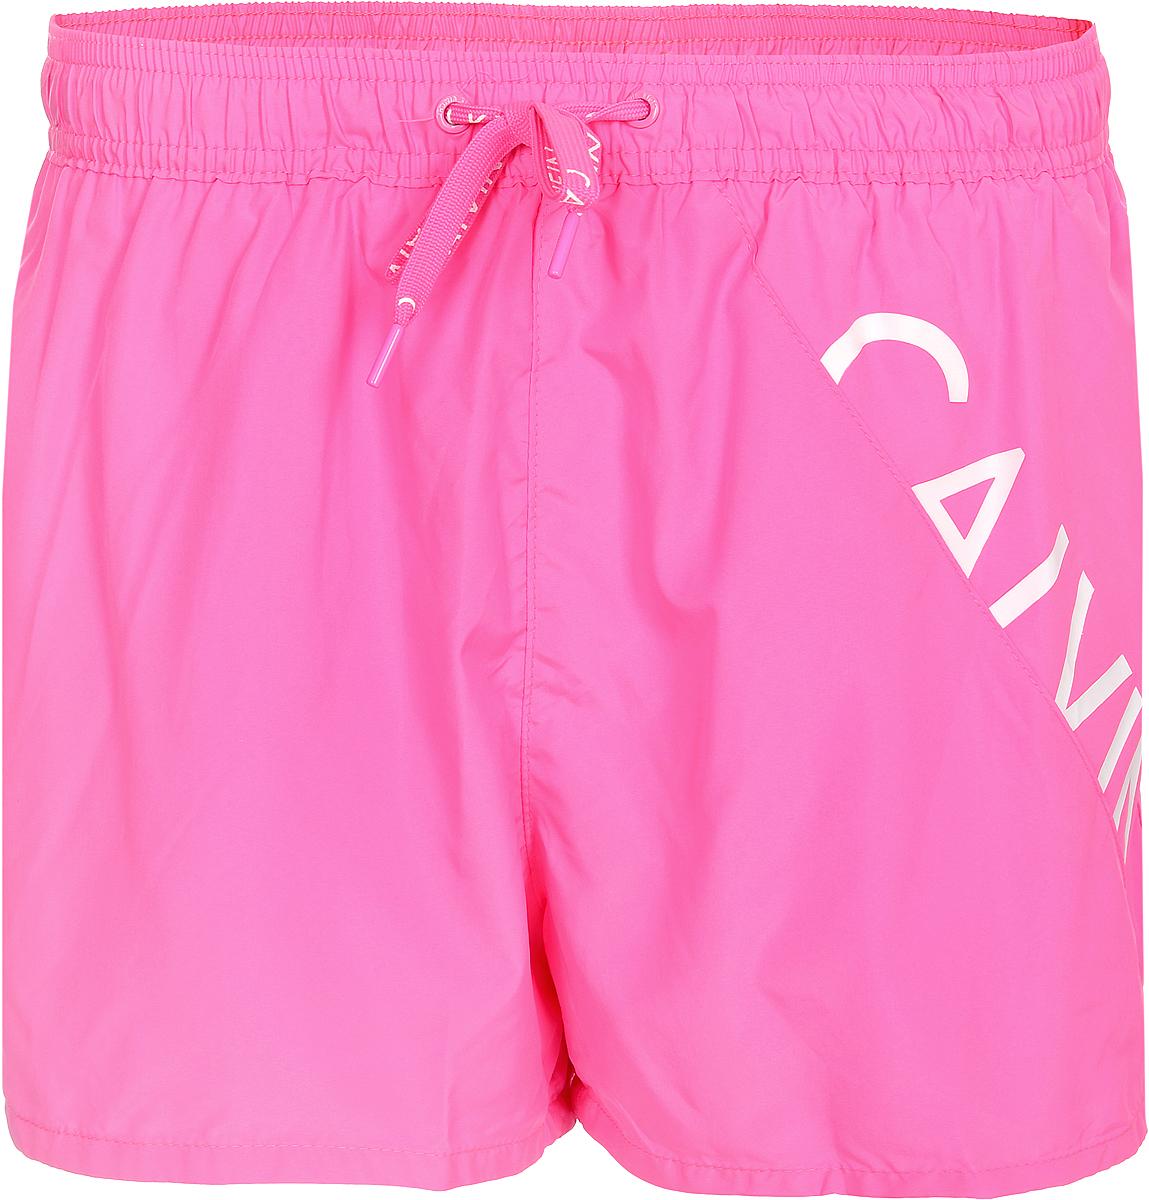 Шорты для плавания мужские Calvin Klein Underwear, цвет: розовый. KM0KM00161_036. Размер L (52) calvin klein new black white colorblock womens size large l crewneck sweater $79